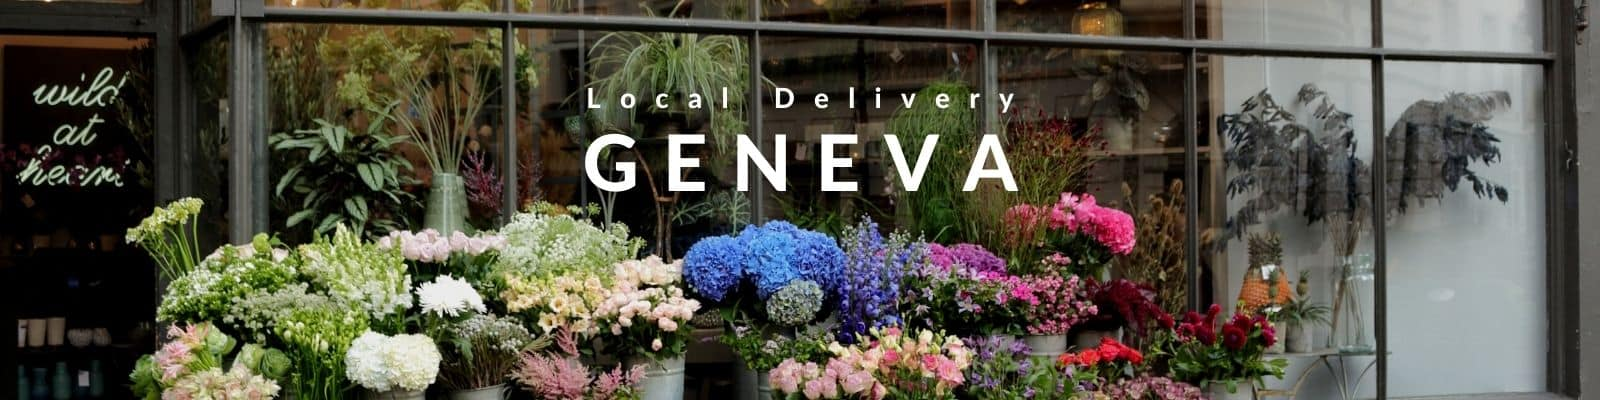 Flower Delivery Geneva - Switzerland - Send Flowers to Geneva